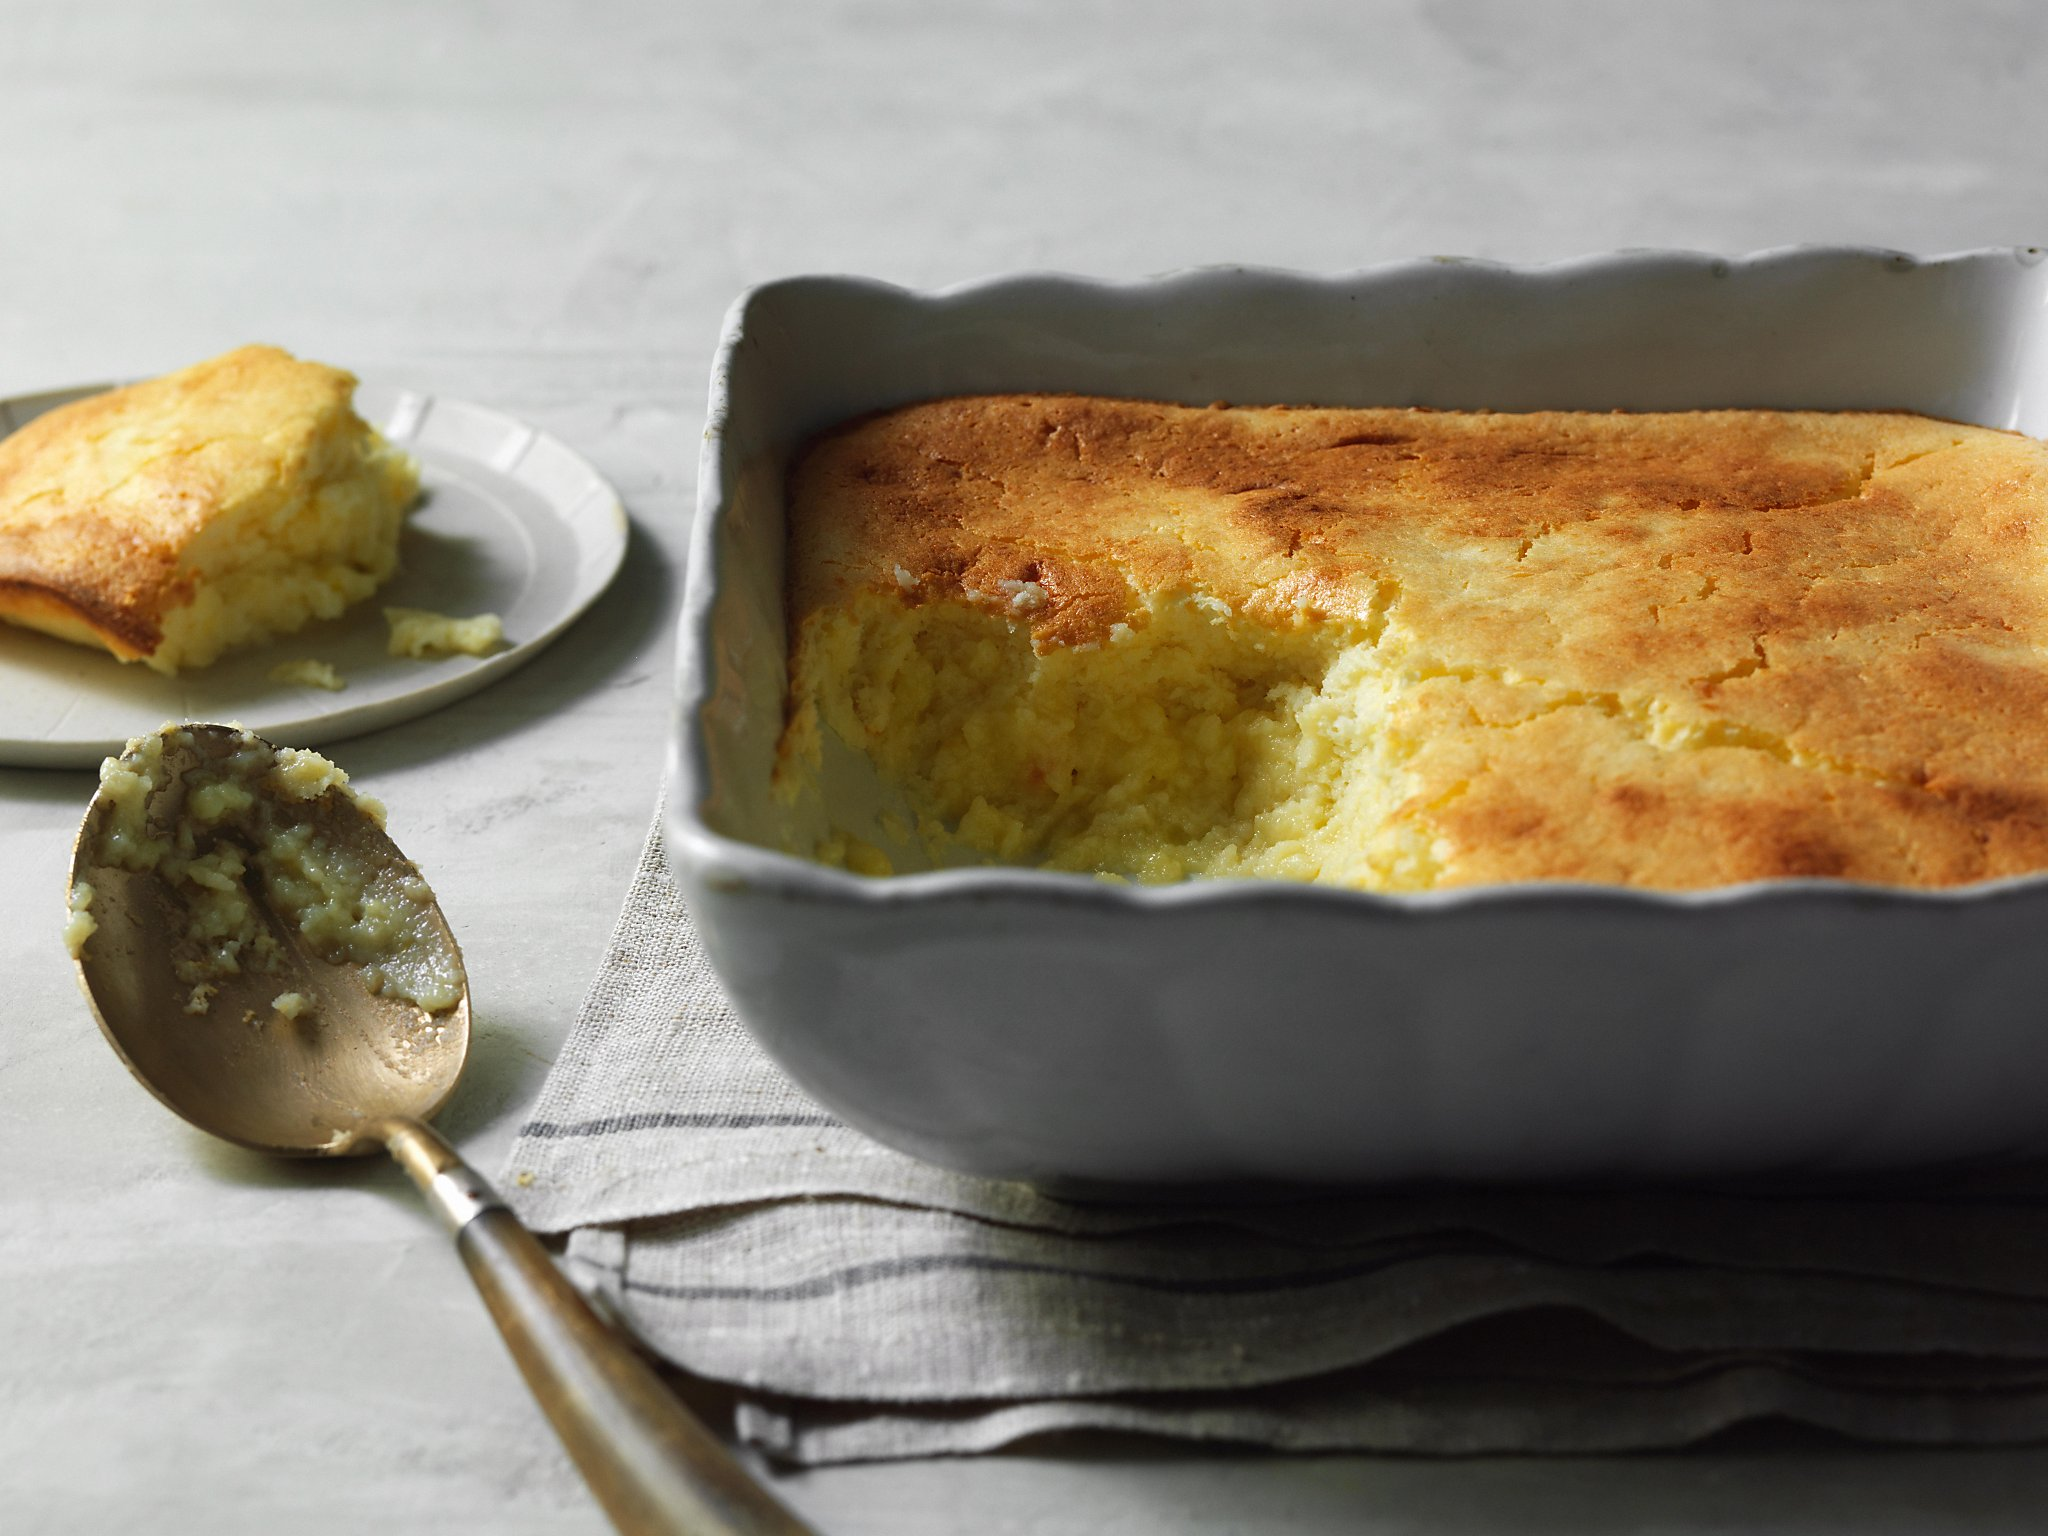 Recipe: How to make Buckeye Roadhouse's Baked Lemon Pudding